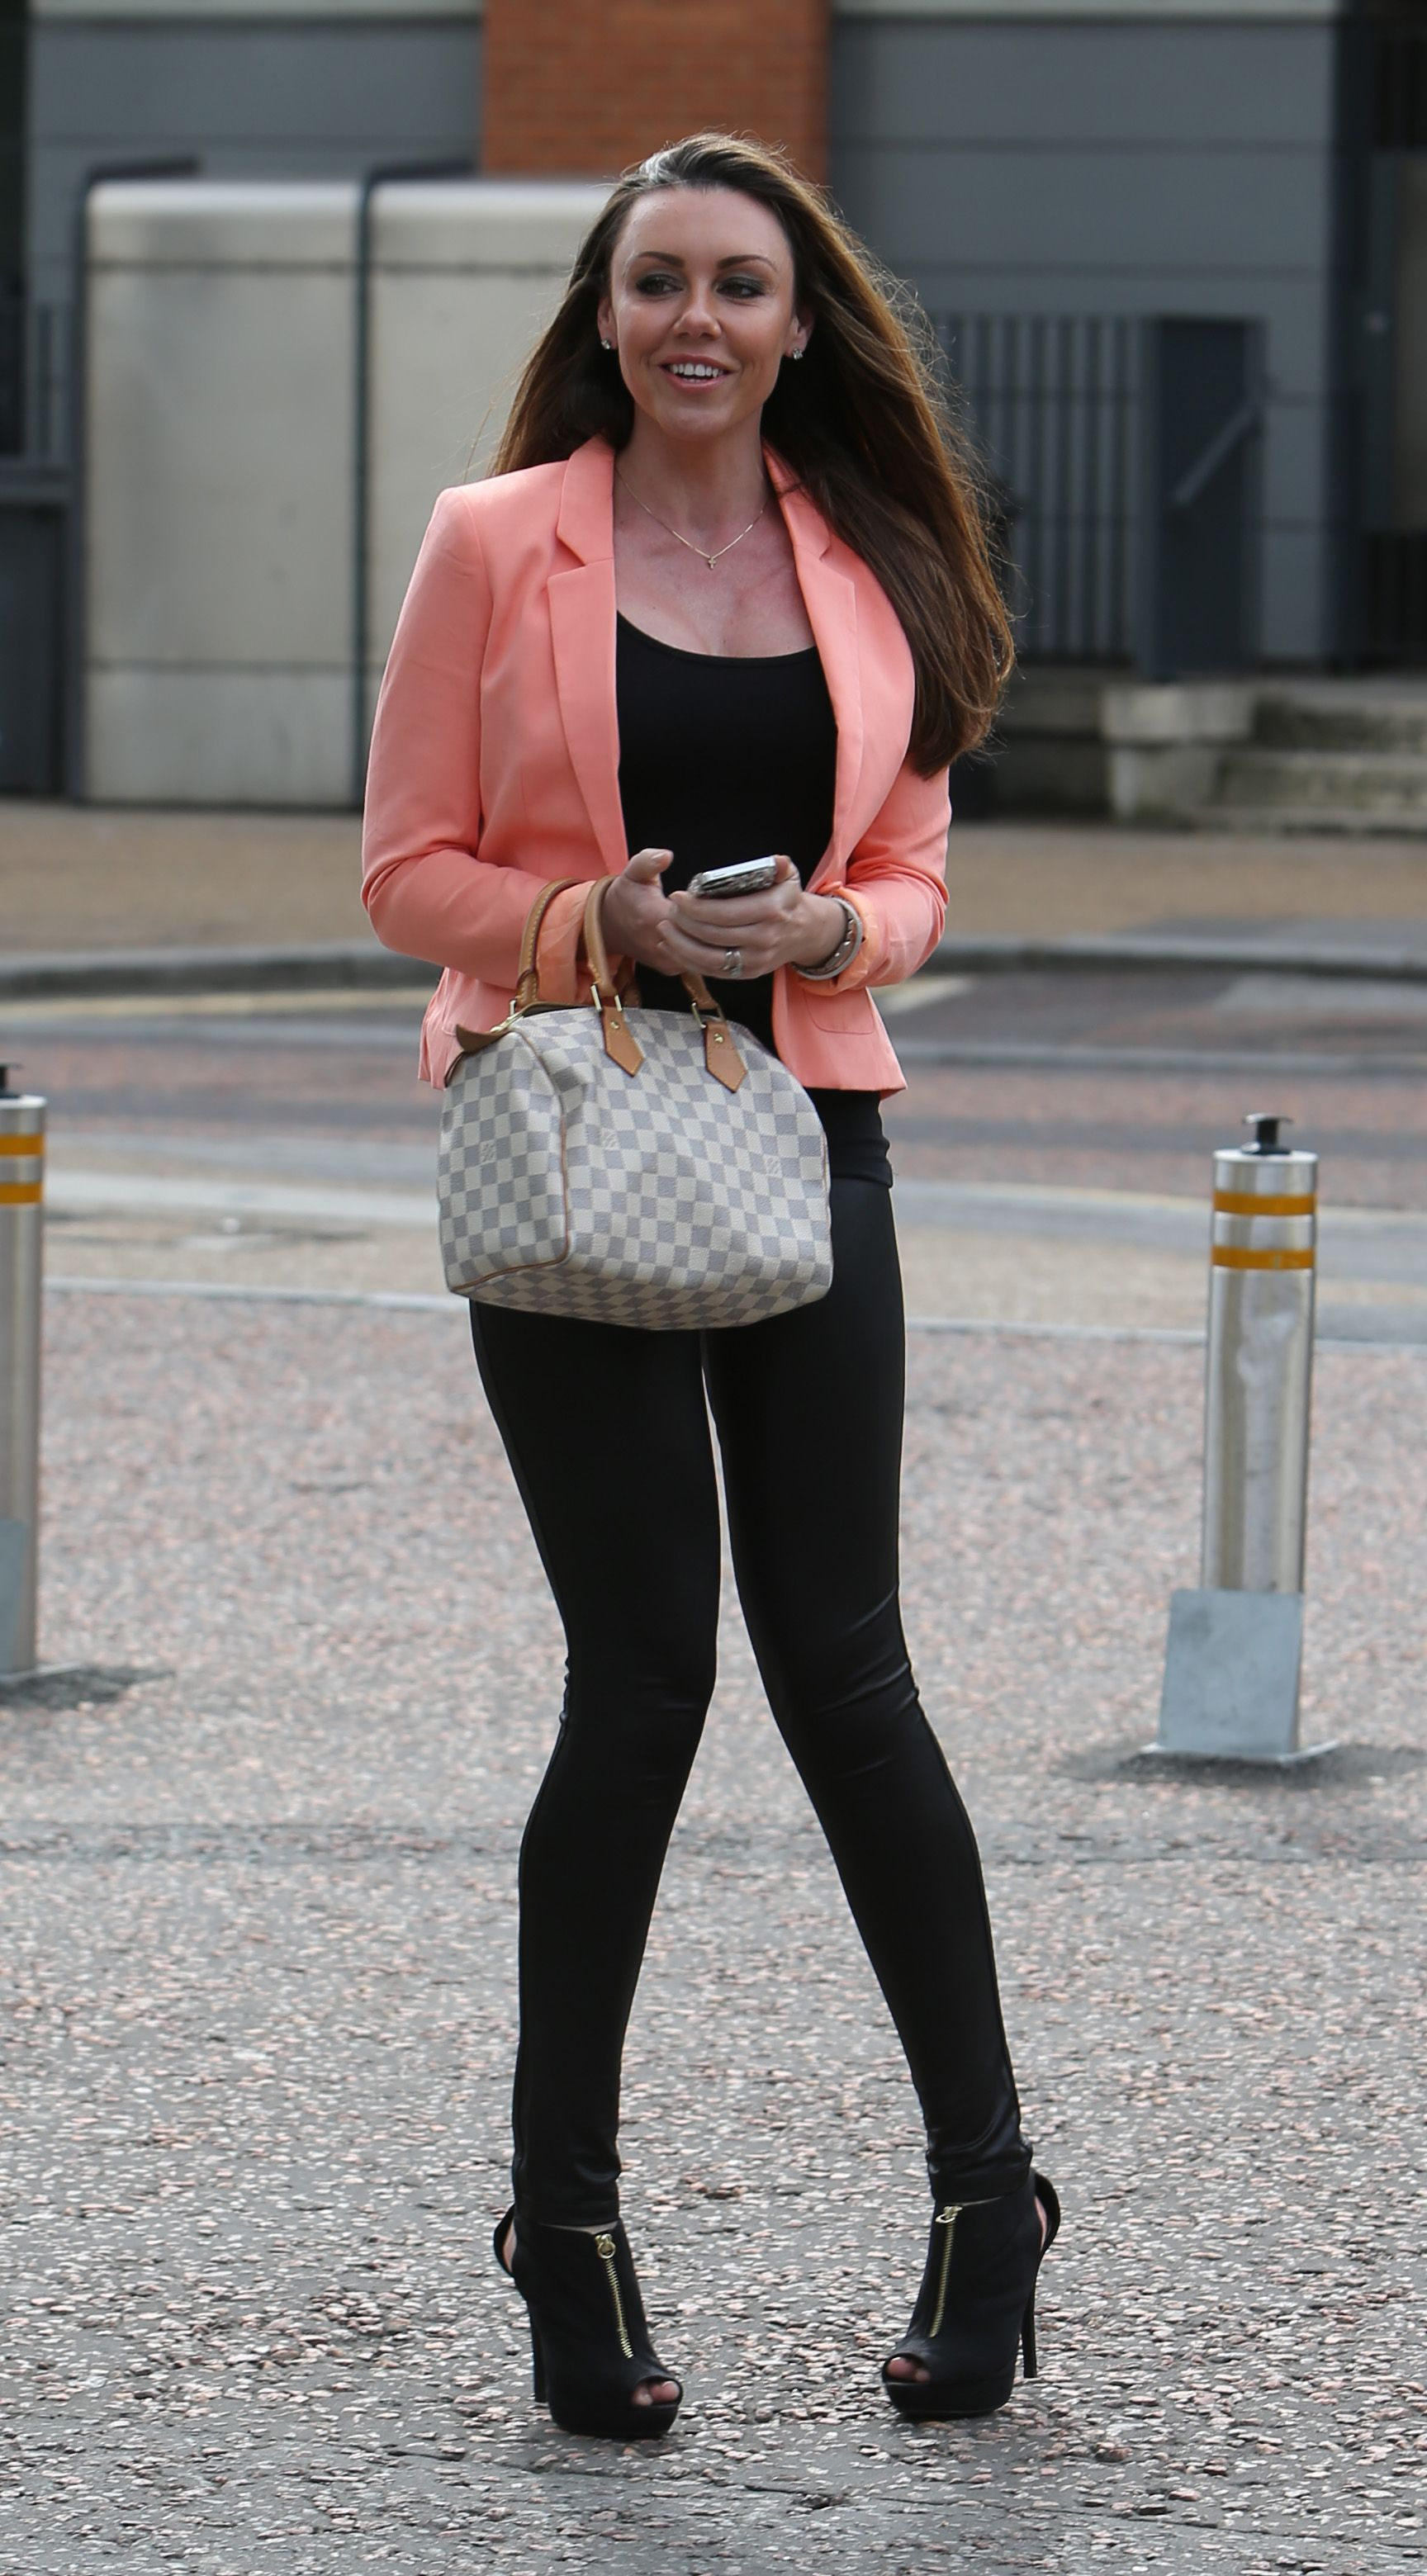 Michelle Heaton  - ITV  Studios 22nd Apr 2013 (7).jpg